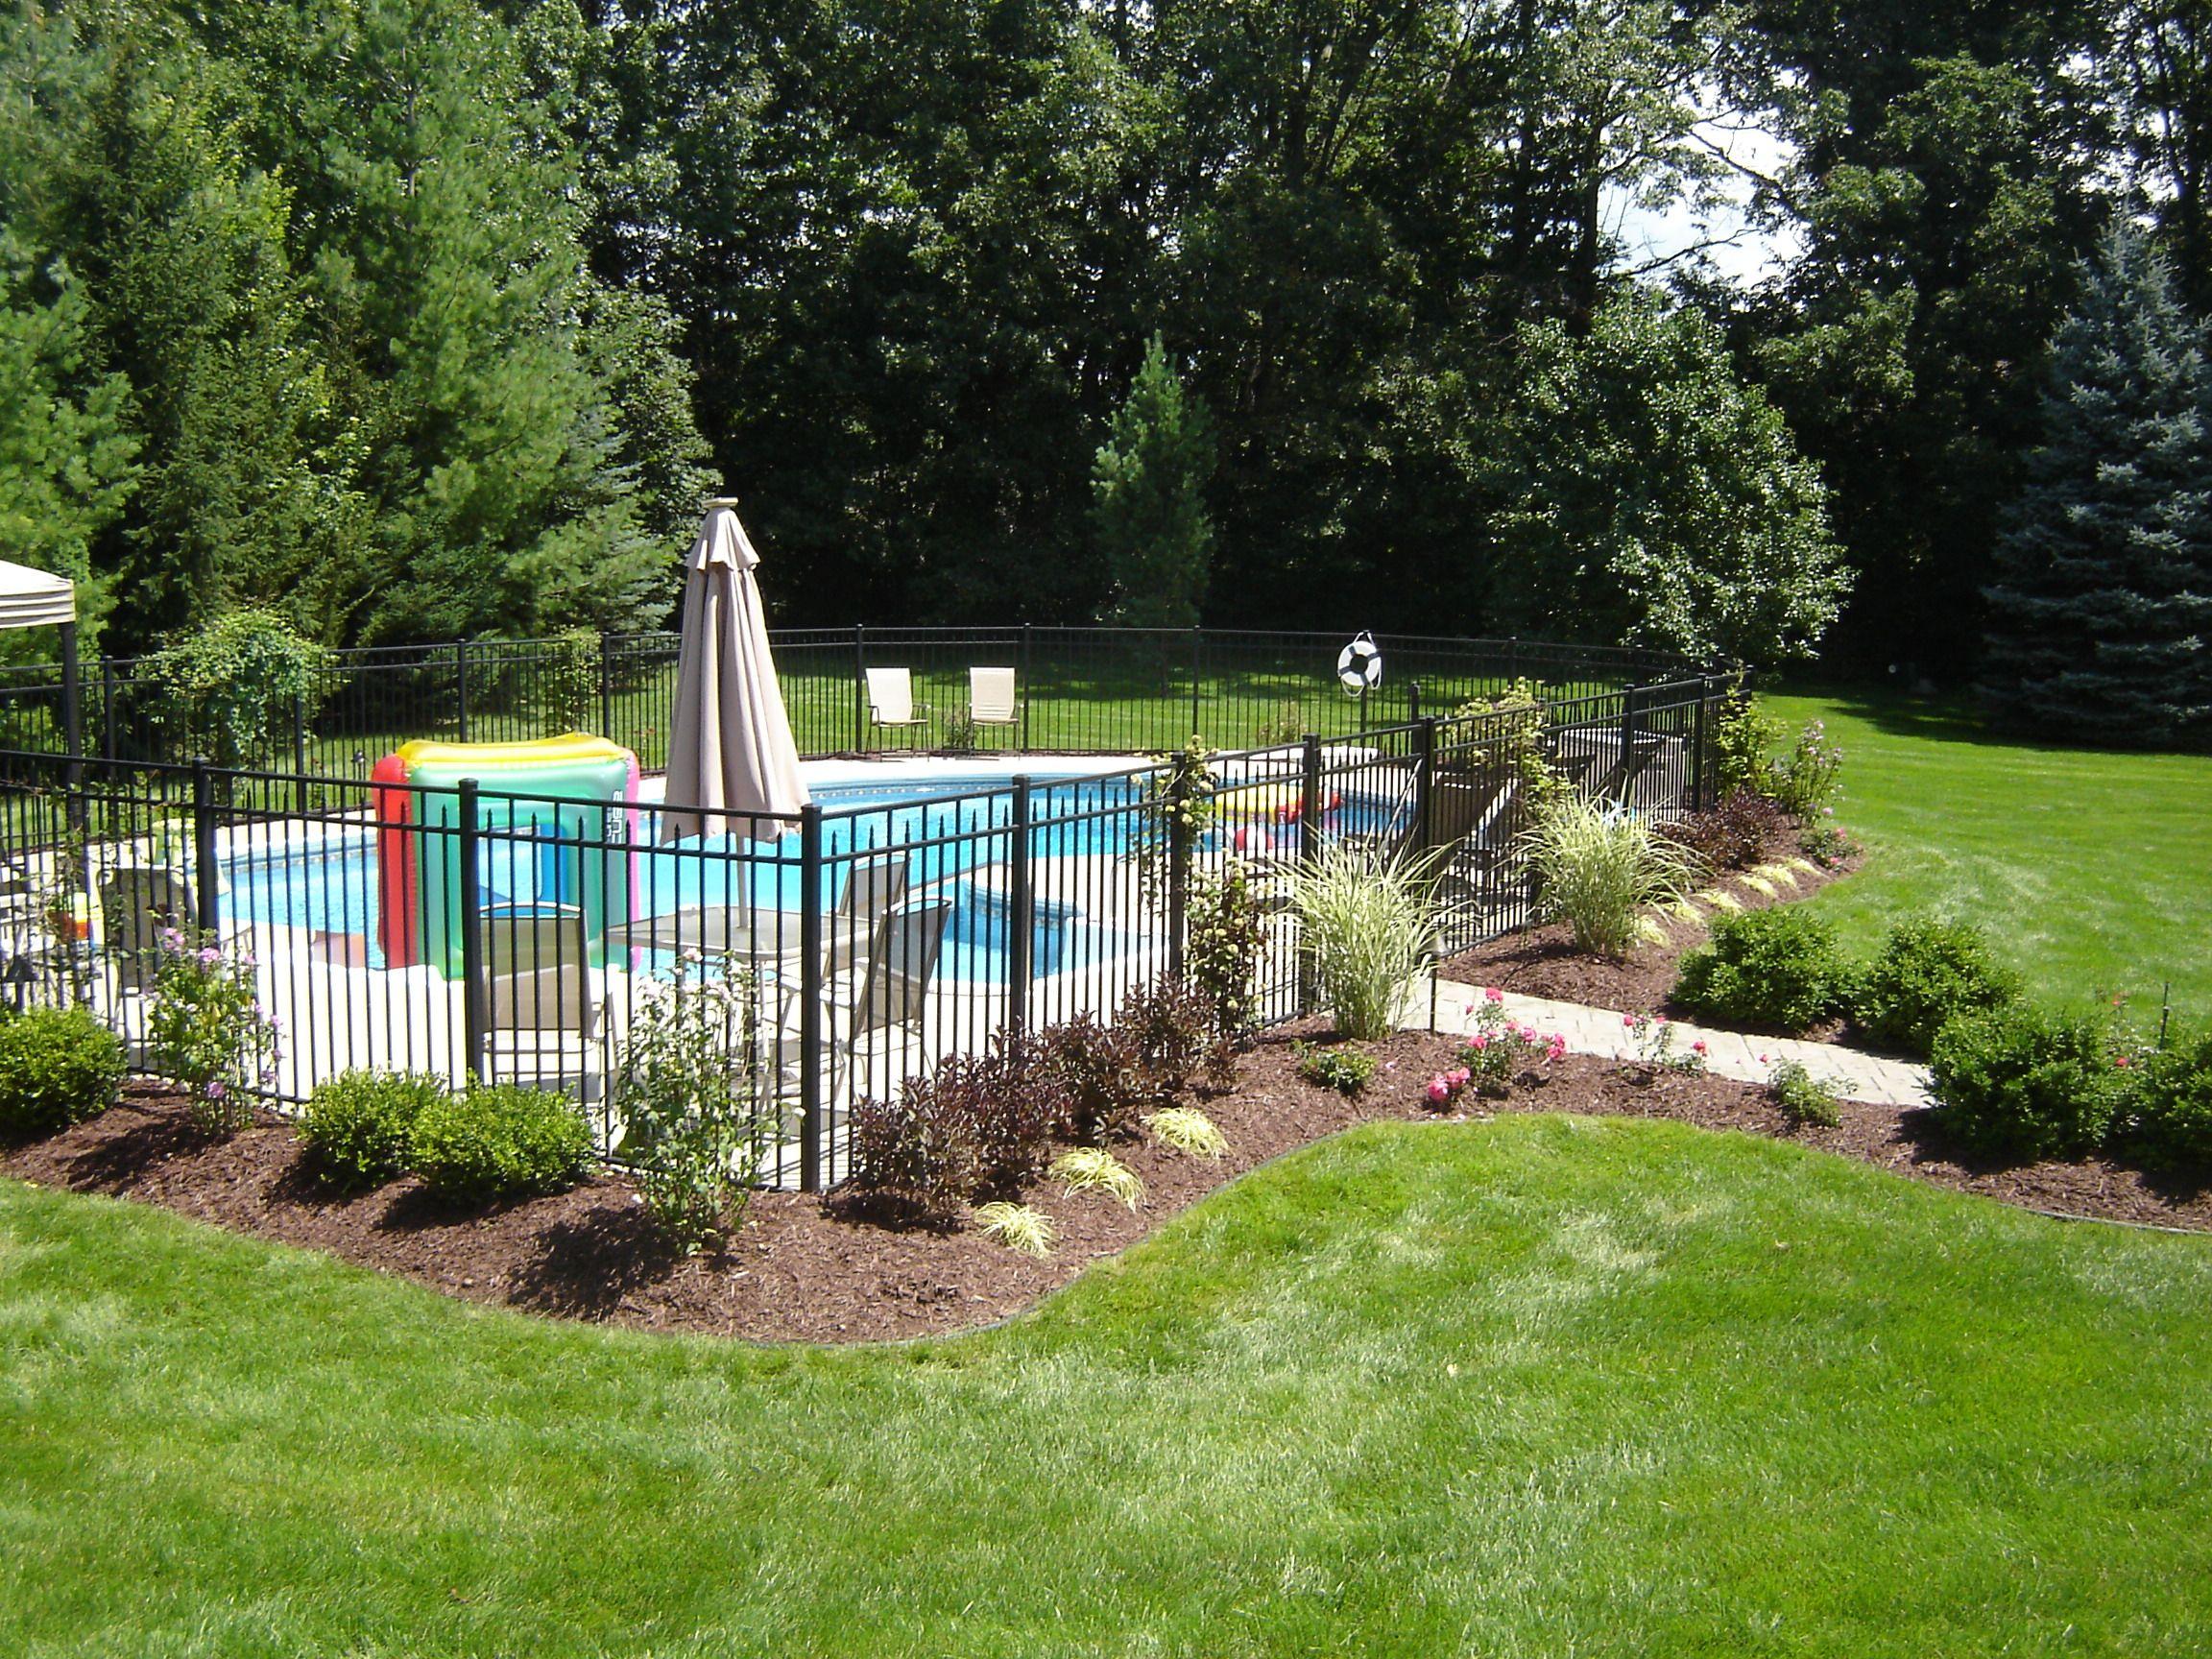 Pool Landscaping Ideas Designs Inground Pool Landscaping Backyard Pool Landscaping Landscaping Around Pool